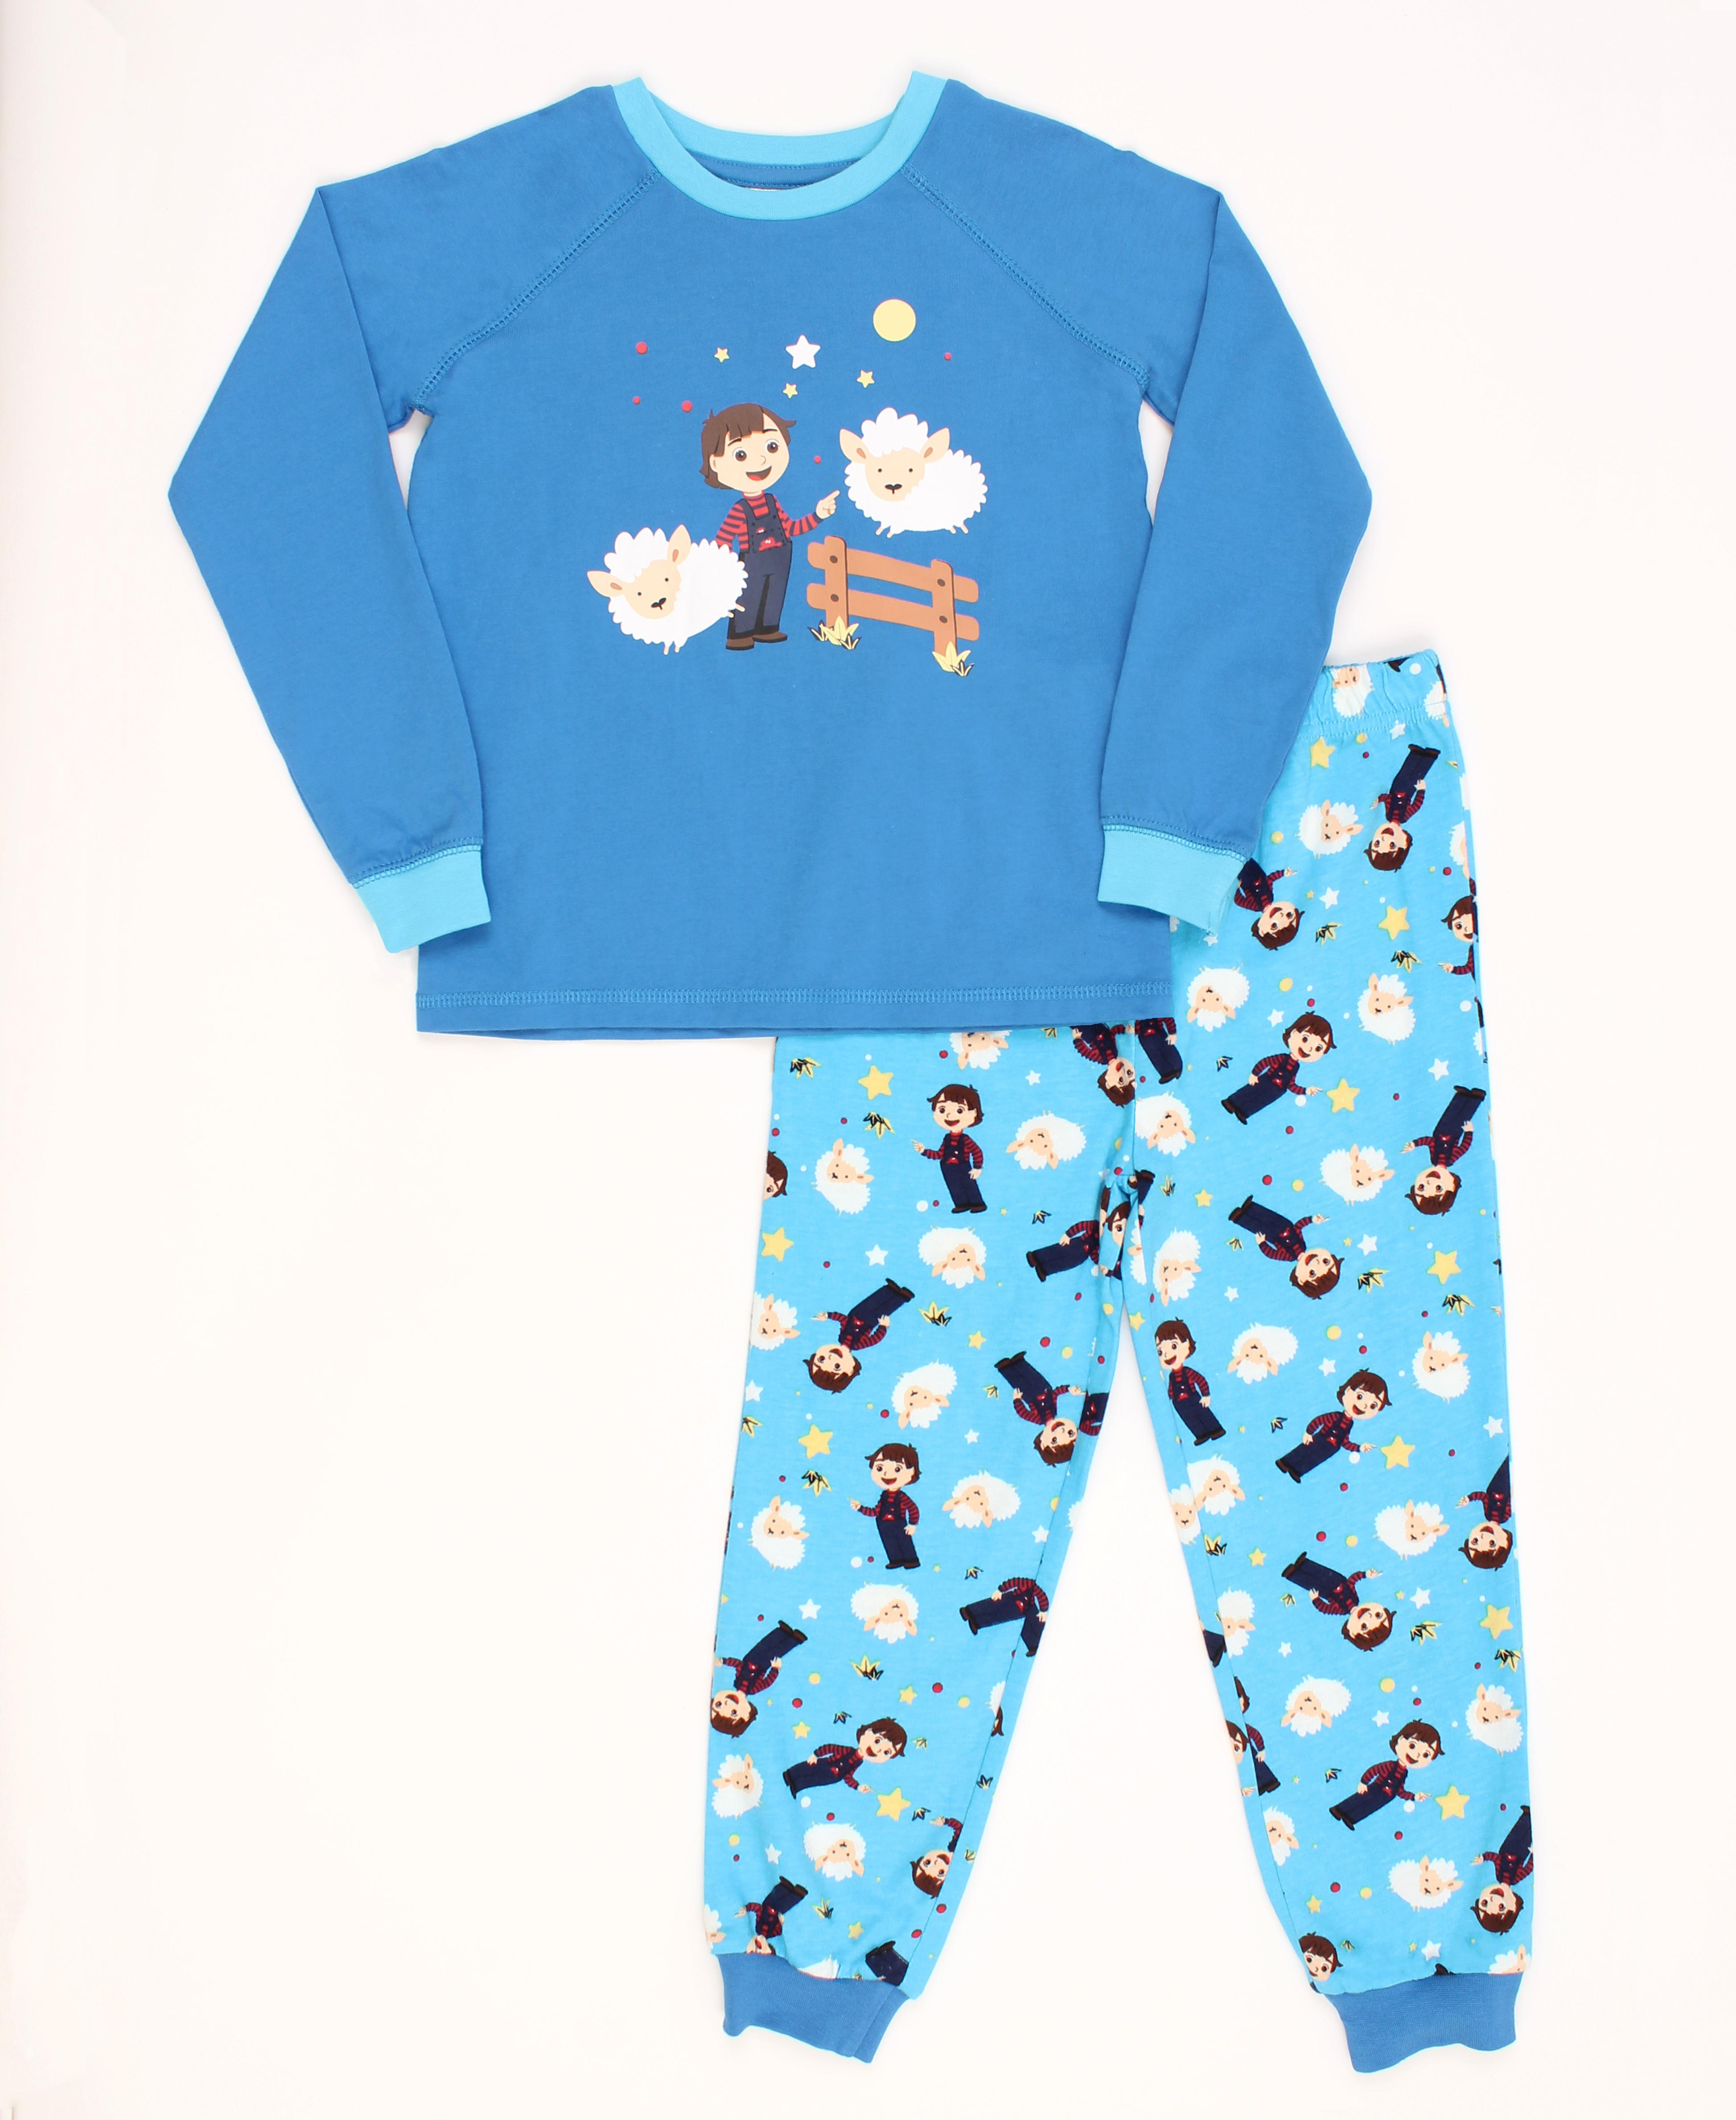 Passe-Partout - Pyjama Pruneau 5-6 ans